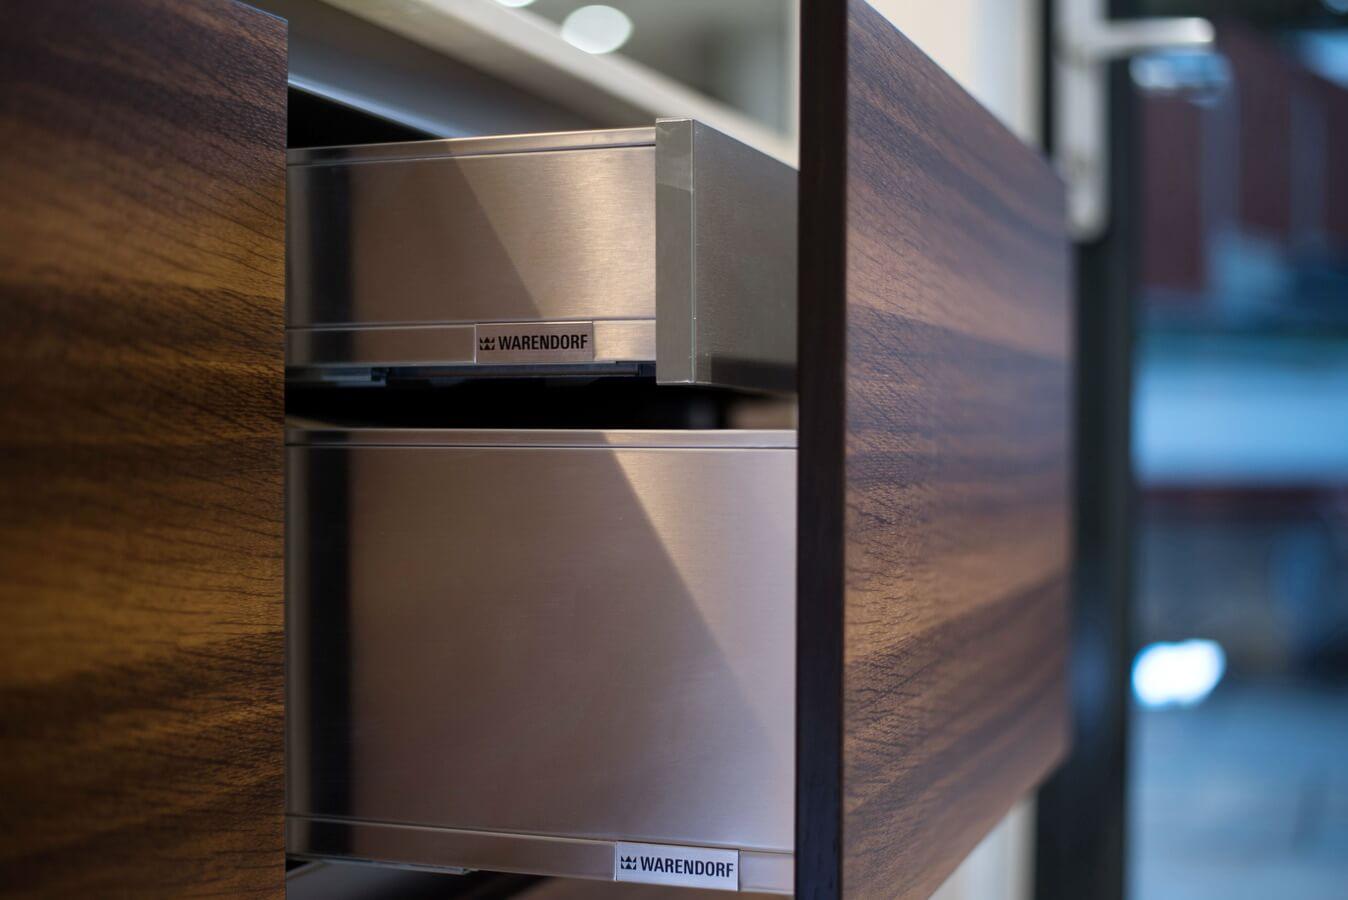 Warendorf-kitchen-drawers-london-6.jpg